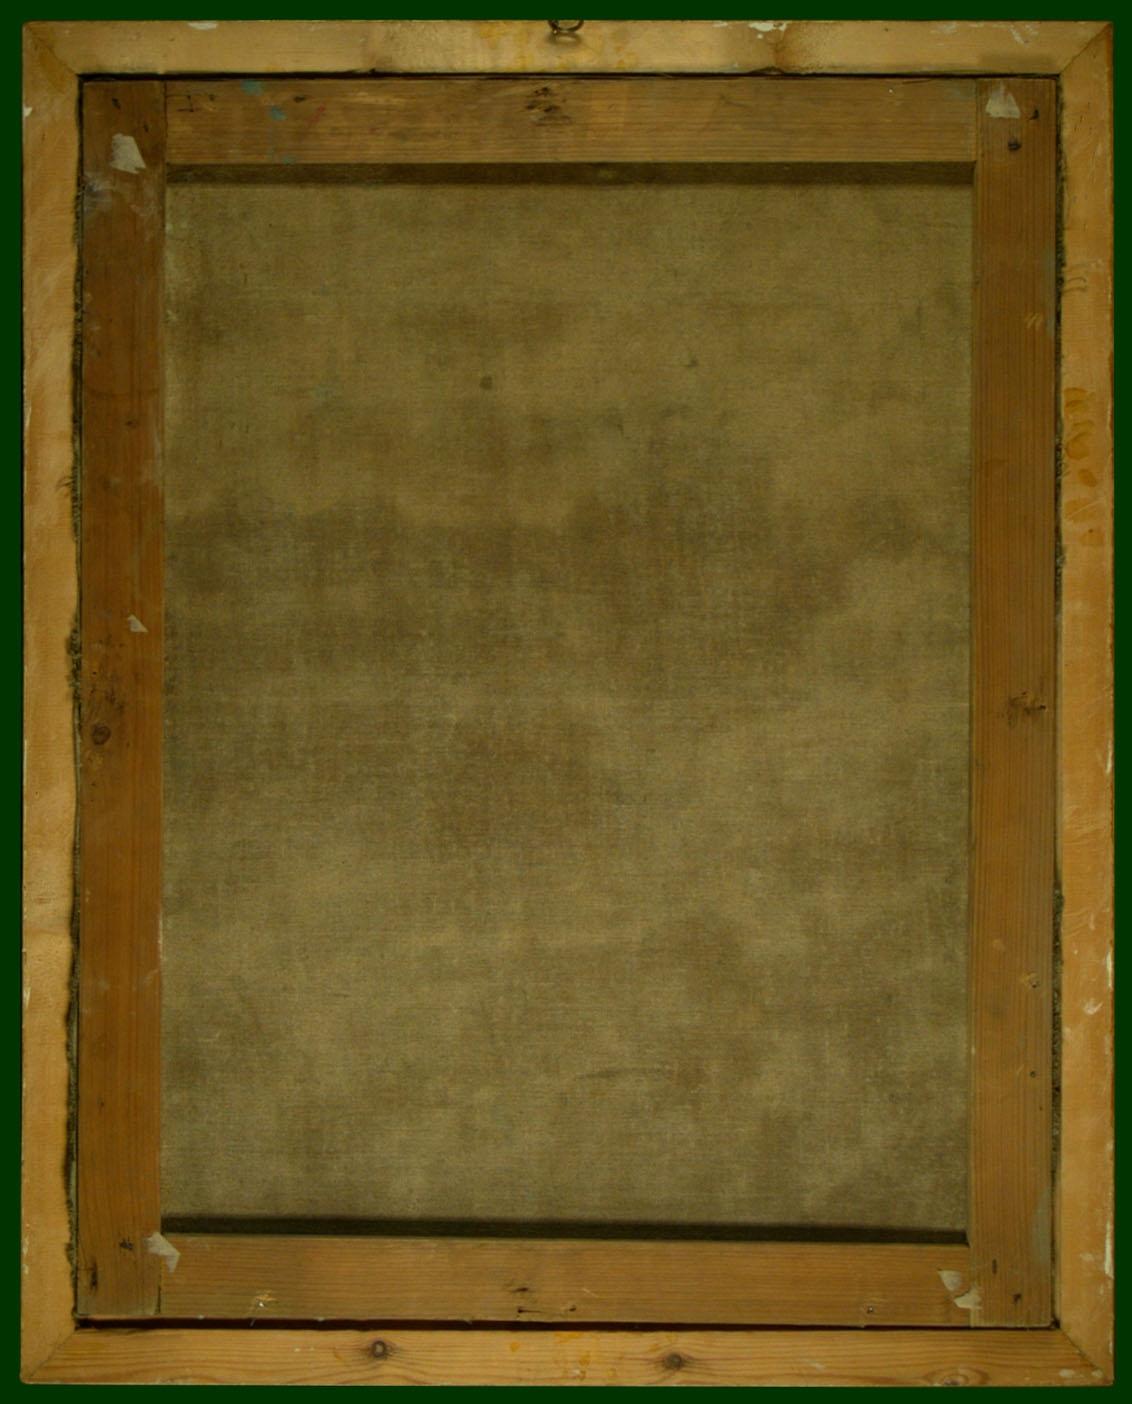 065-009hat.JPG (1132×1404)